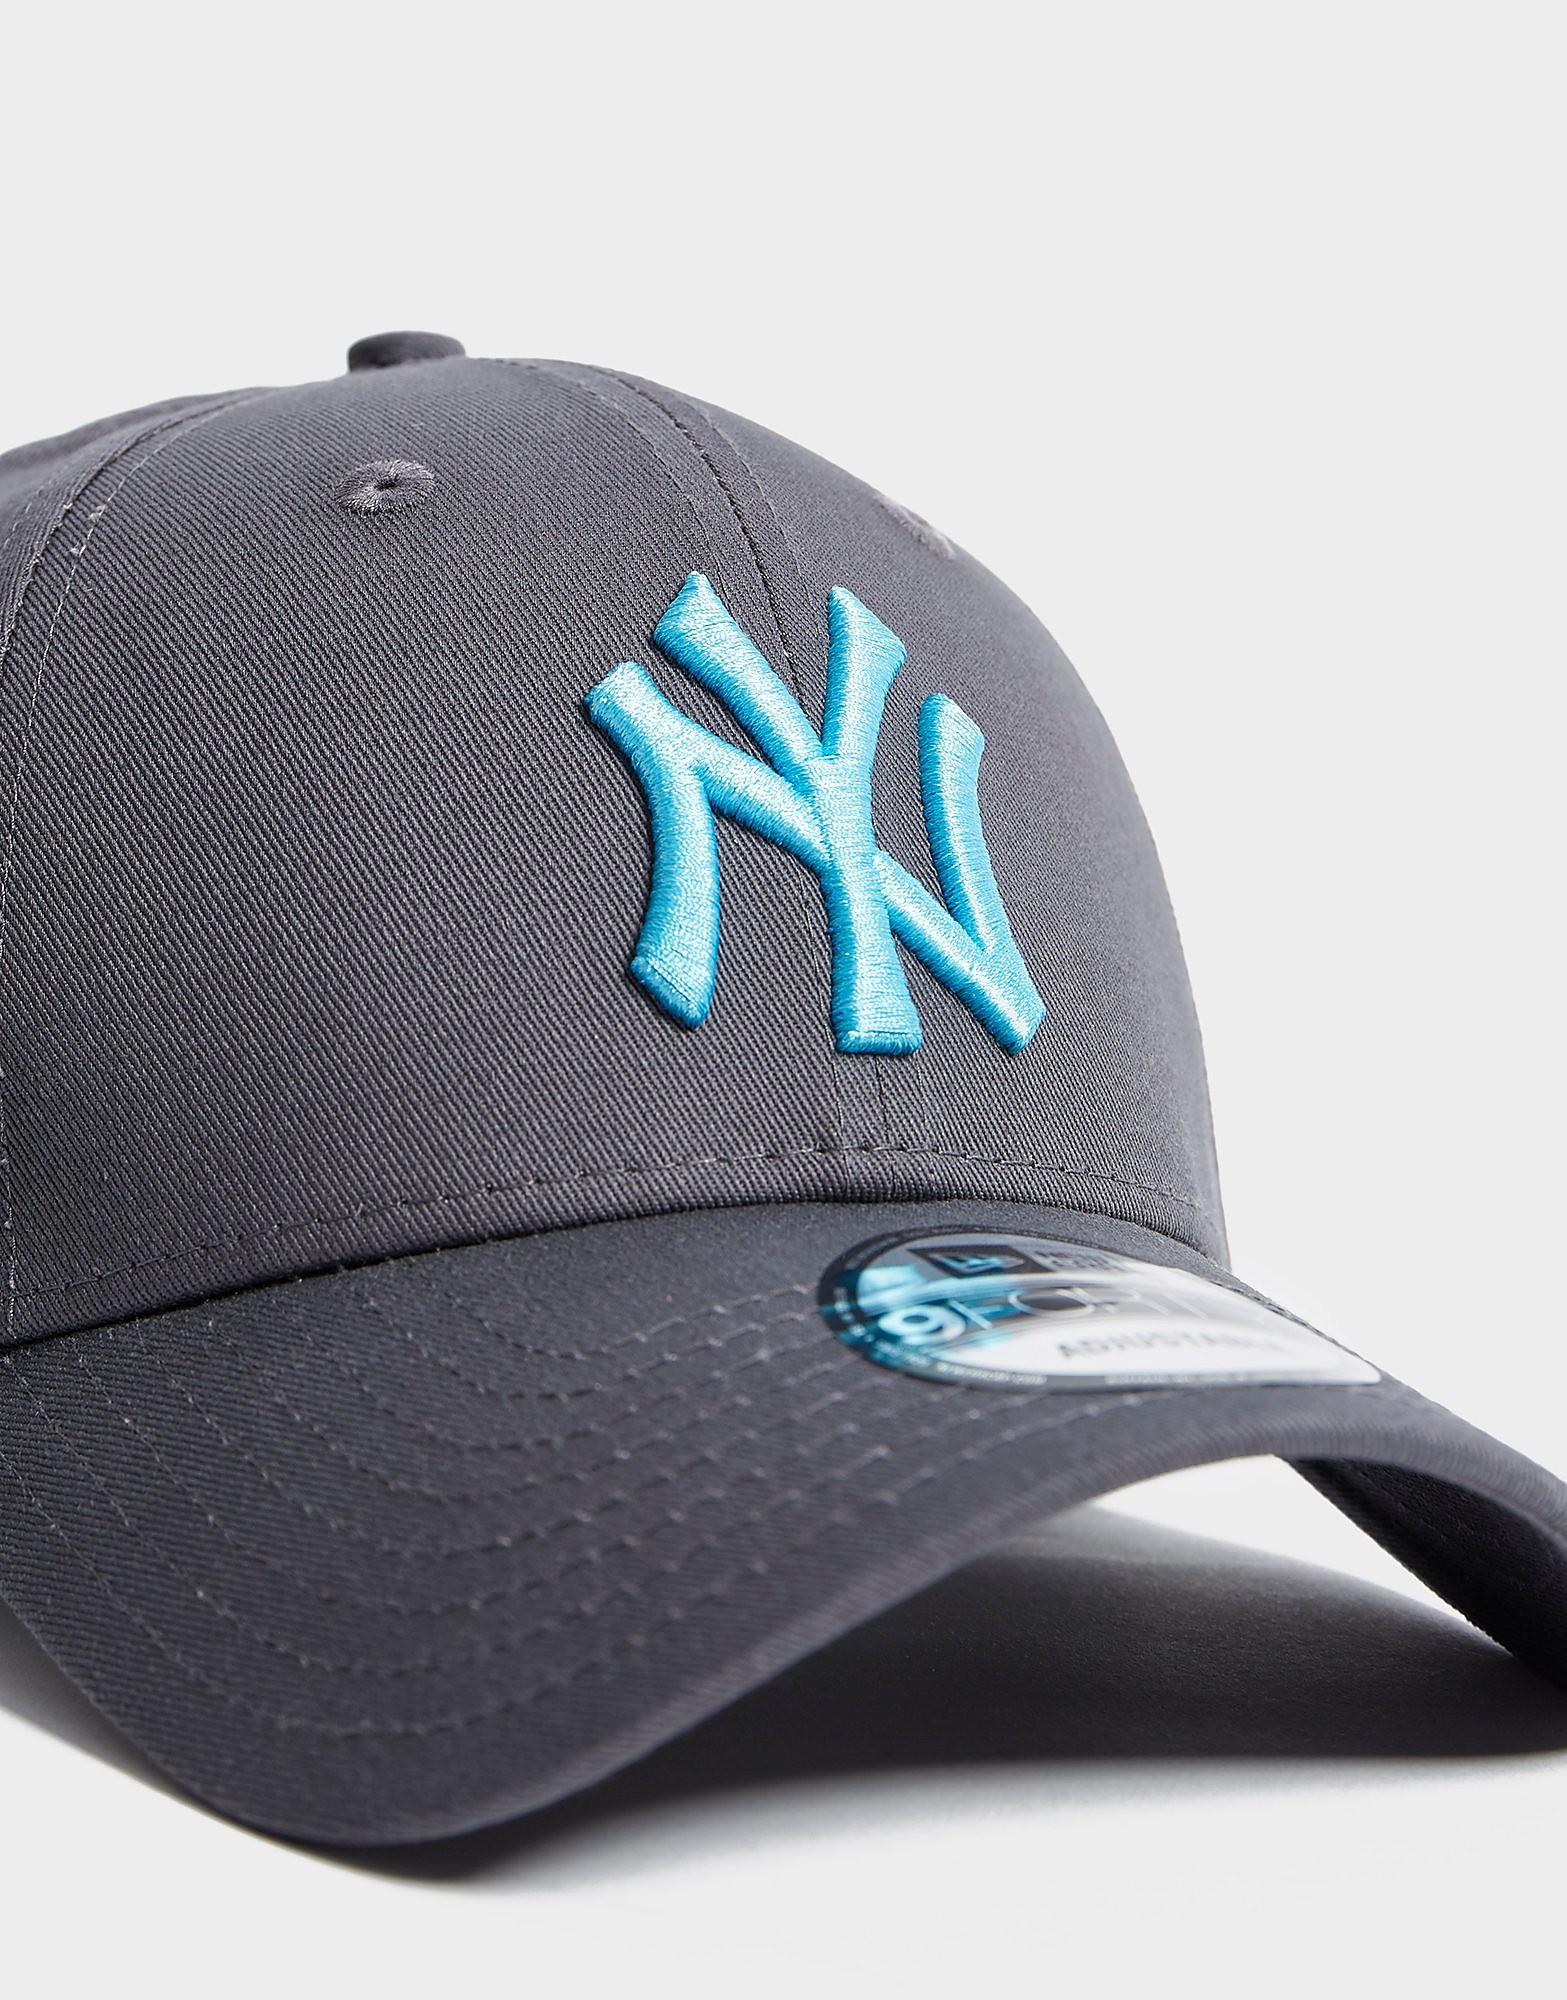 New Era MLB New York Yankees 9FORTY Cap